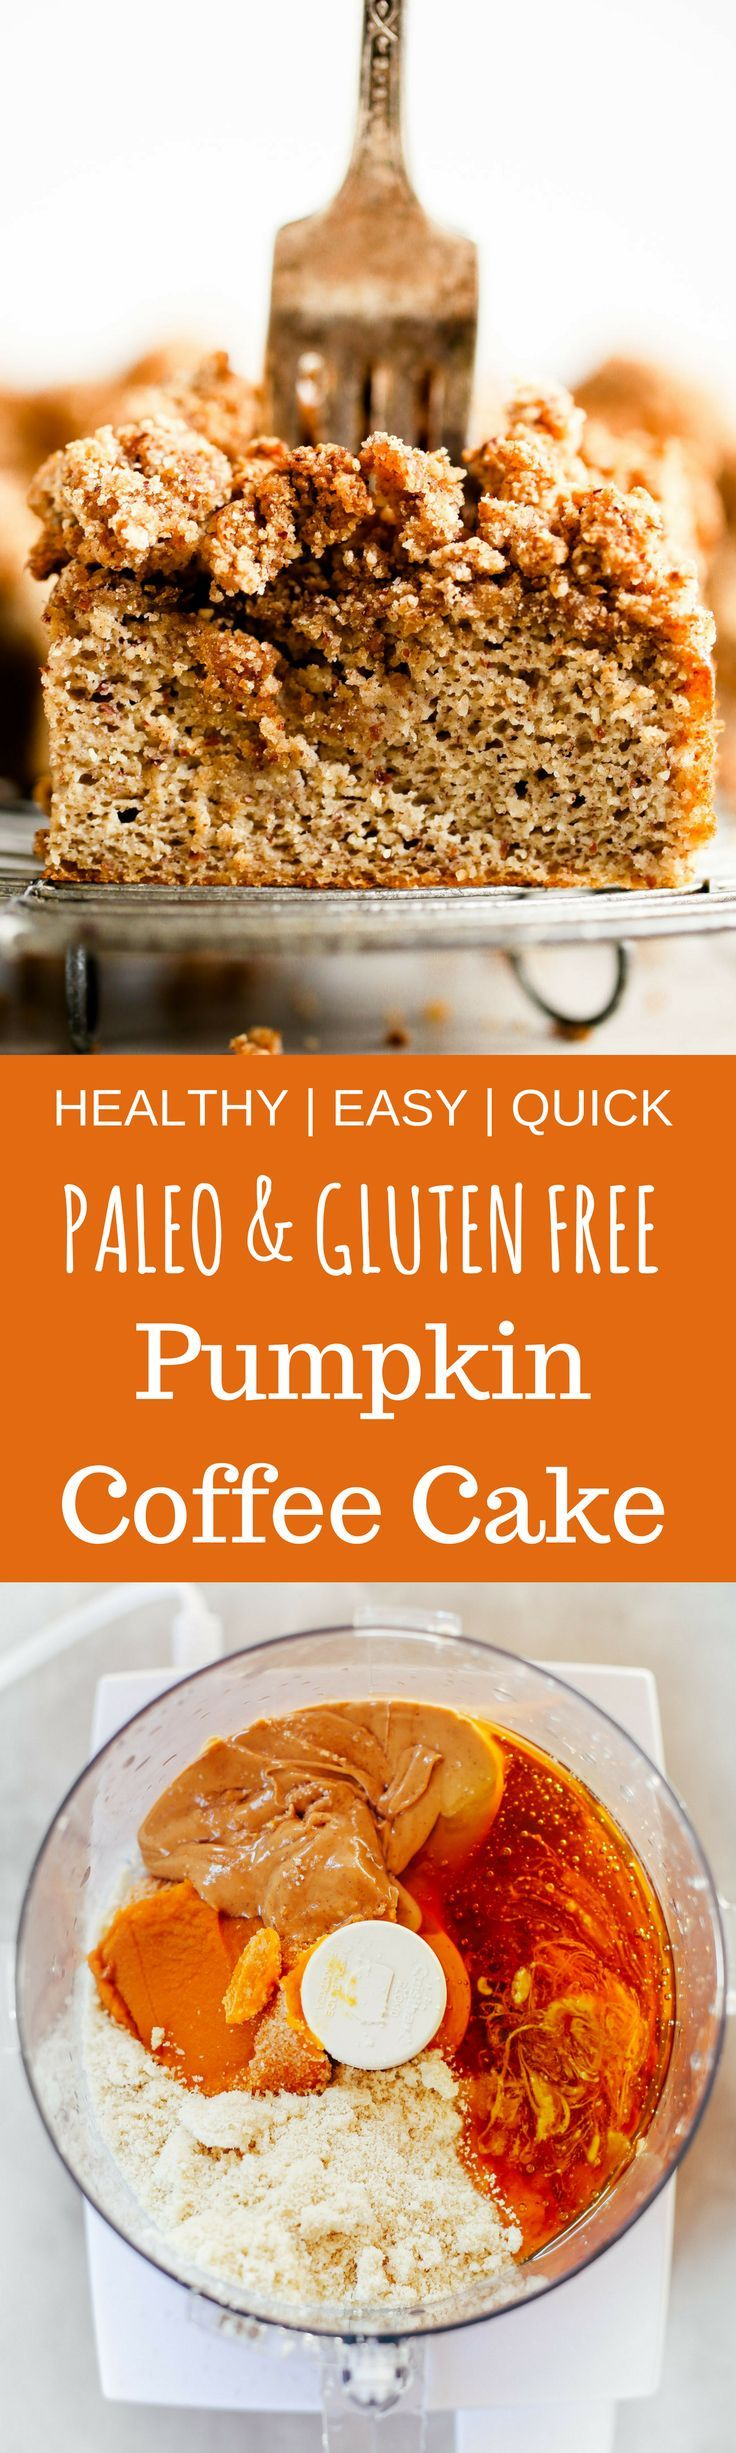 Gluten Free Paleo Pumpkin Chocolate Chip Coffee Cake